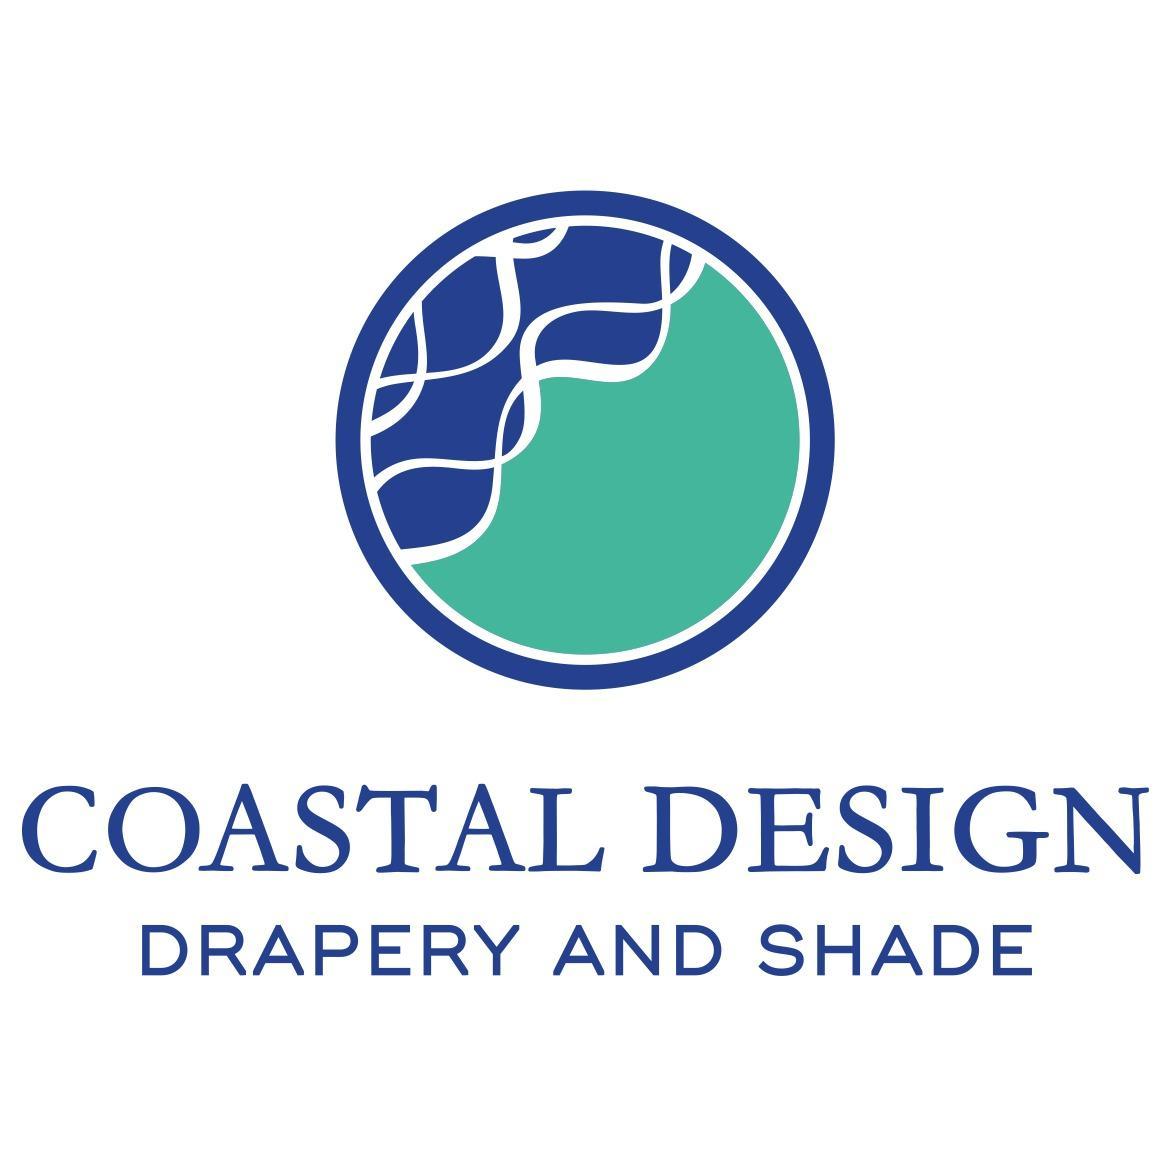 Coastal Design Drapery and Shade image 12